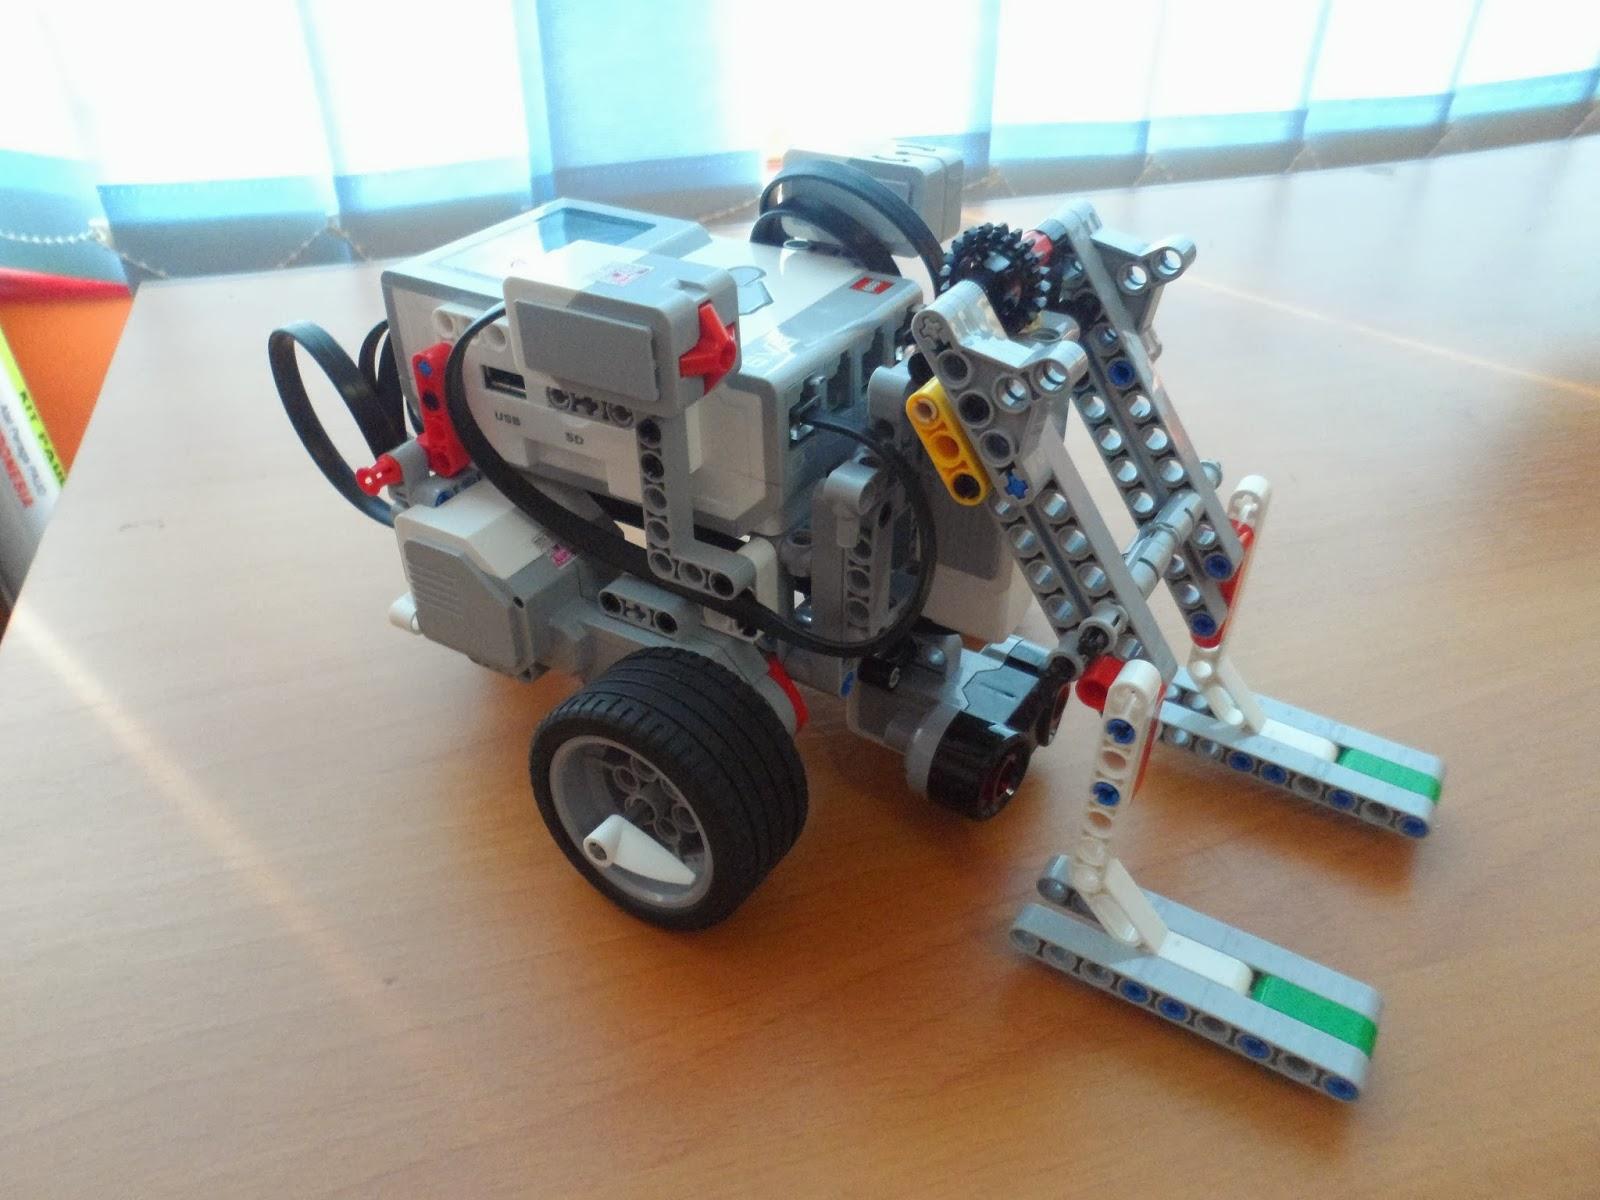 Robotics Education Centre Forklift Ev3